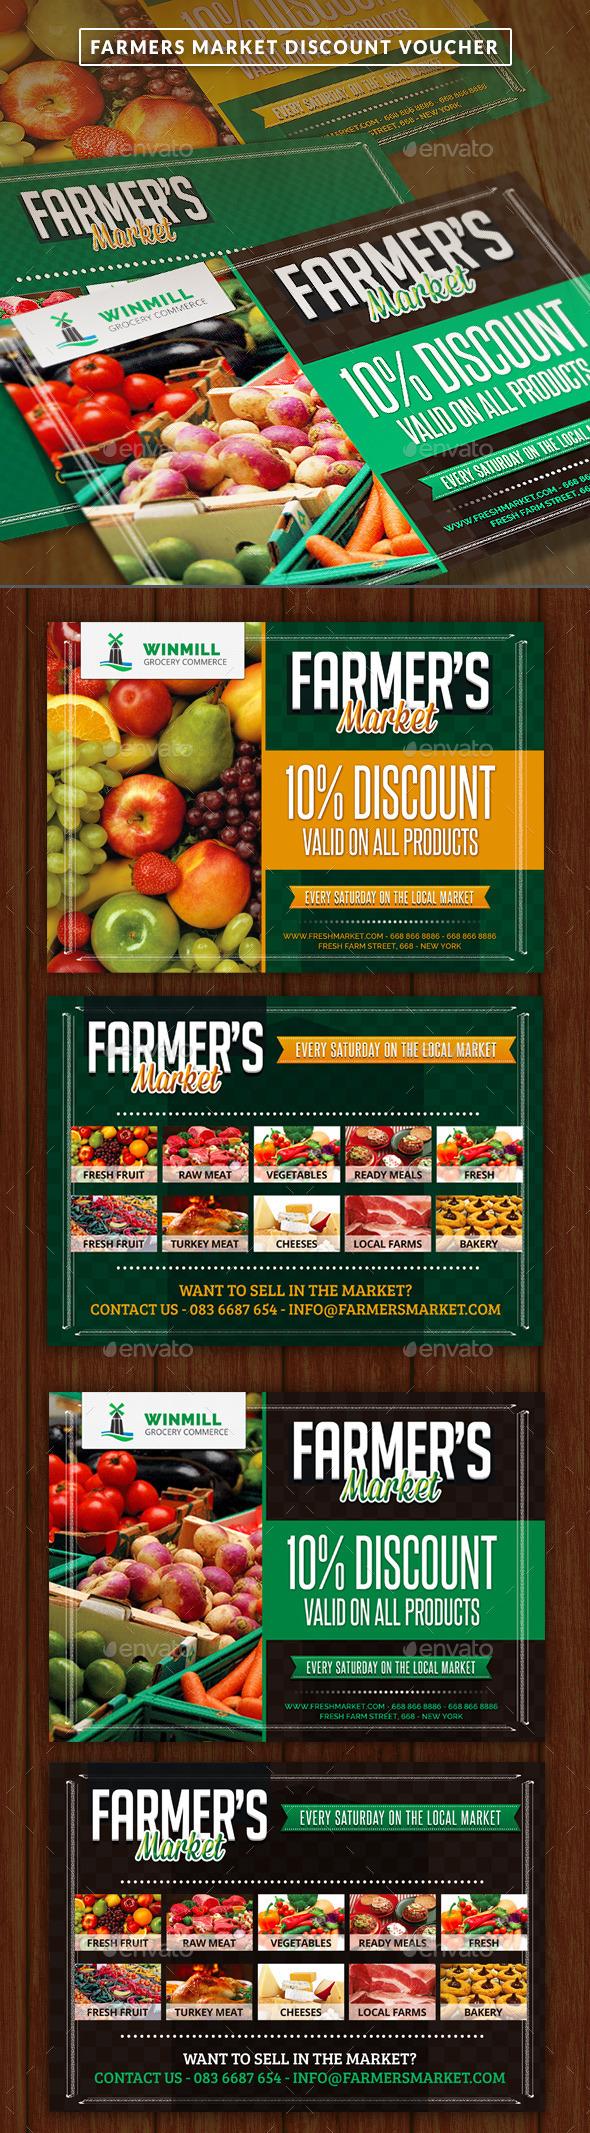 Farmer's Market Commerce Discount Voucher - Cards & Invites Print Templates